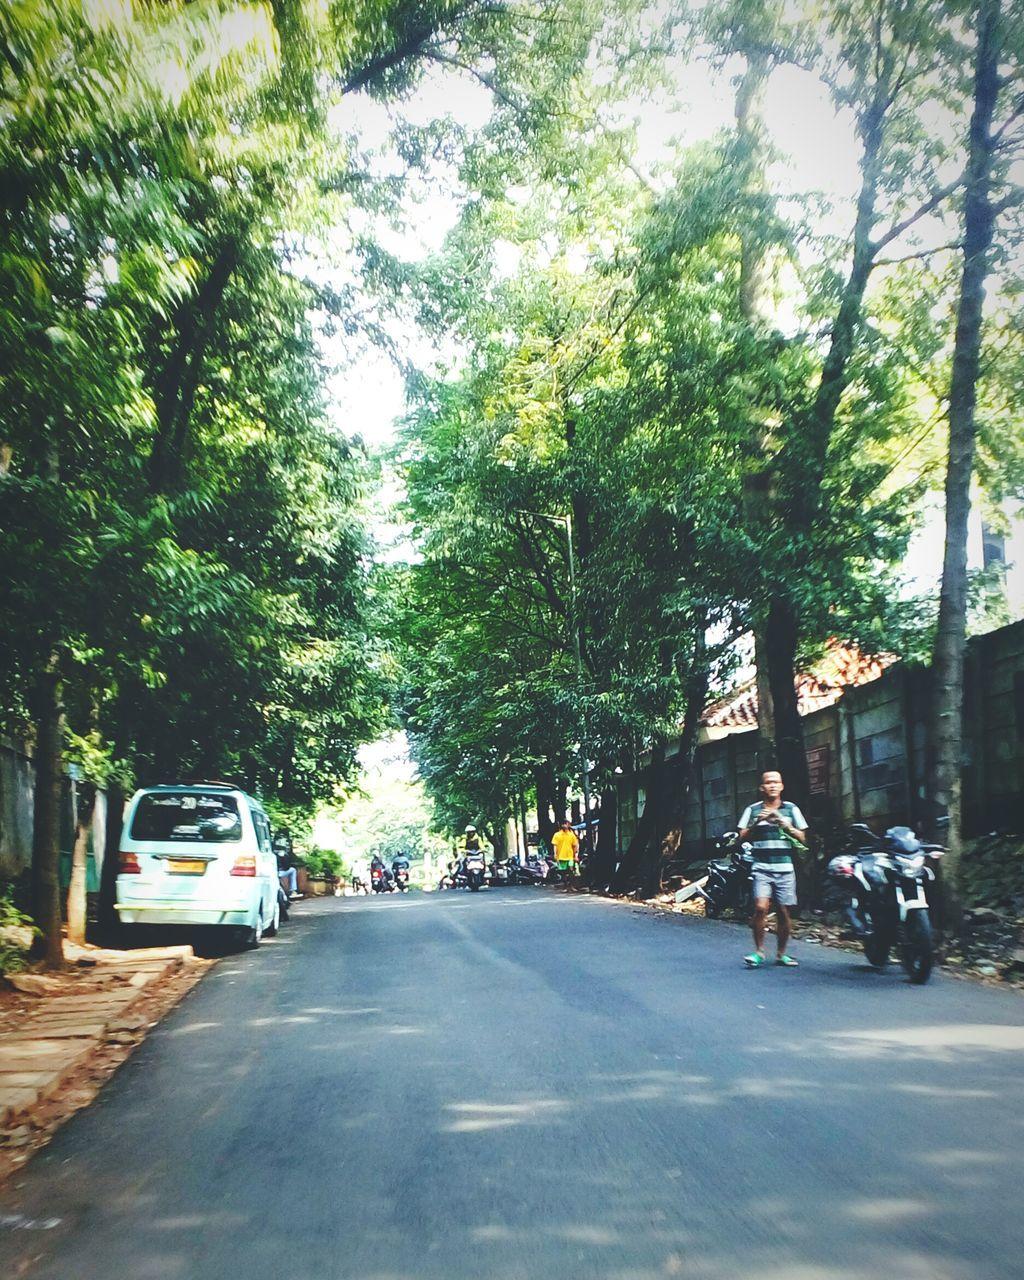 Long Empty Road Along Trees